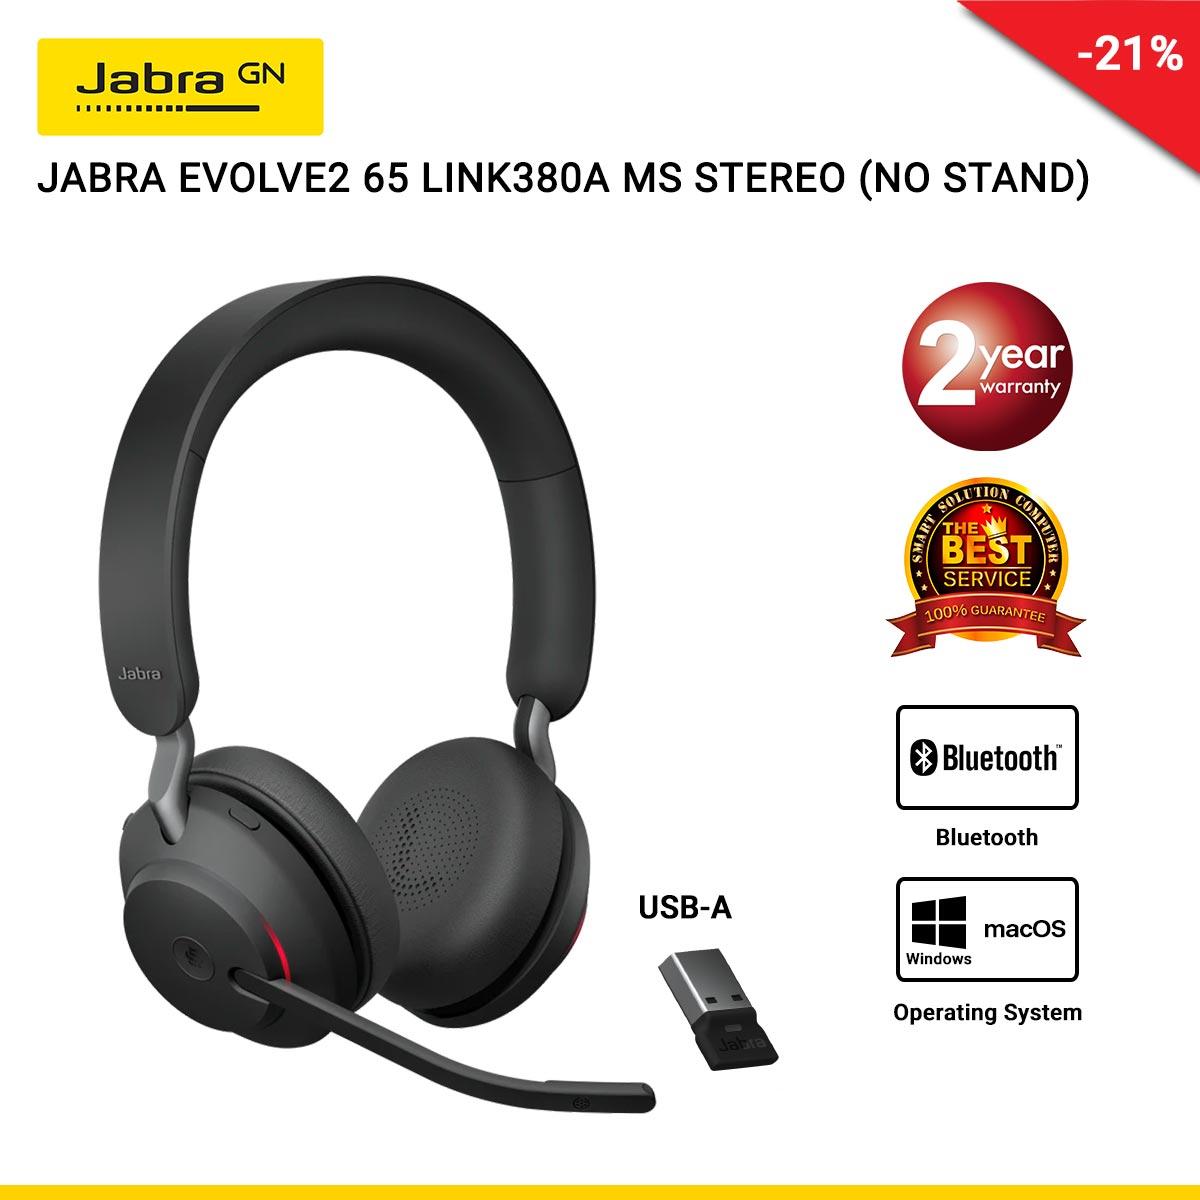 JABRA EVOLVE2 65 LINK380A MS STEREO BLACK (NO STAND) (JBA-26599-999-999)